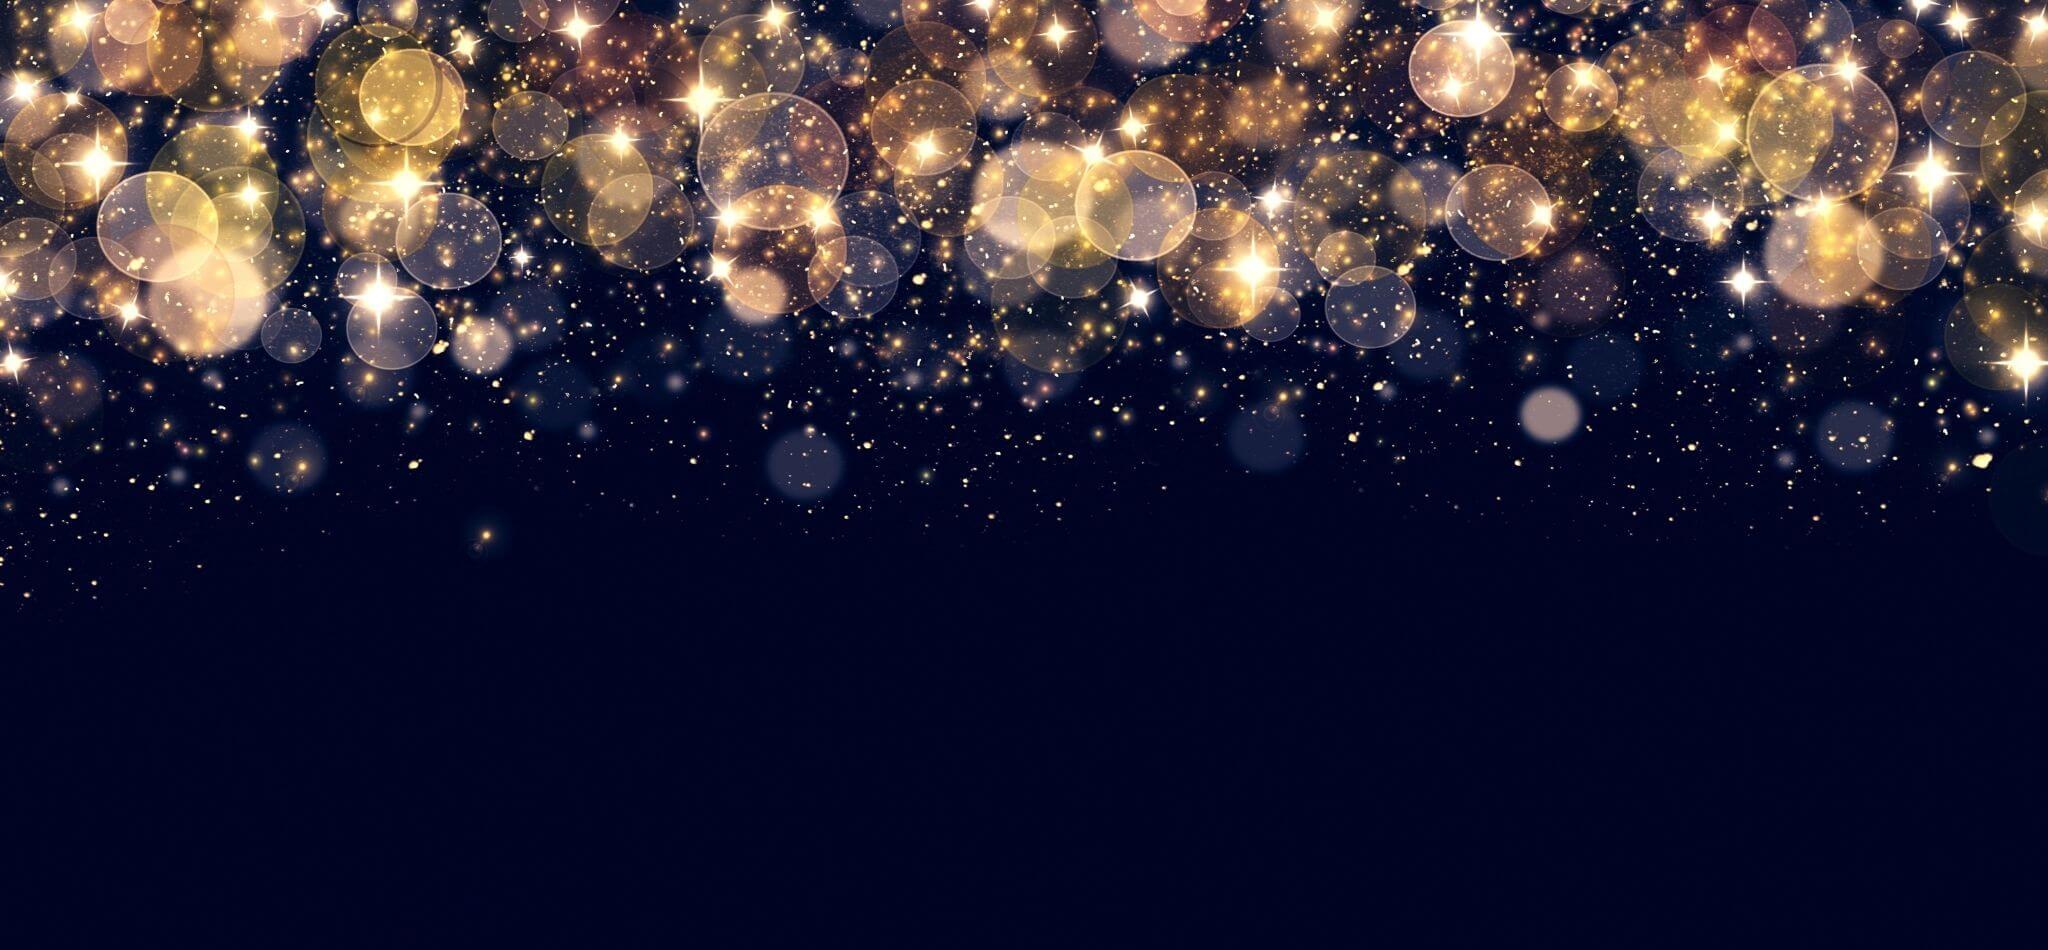 creative grad night ideas black background with golden lights